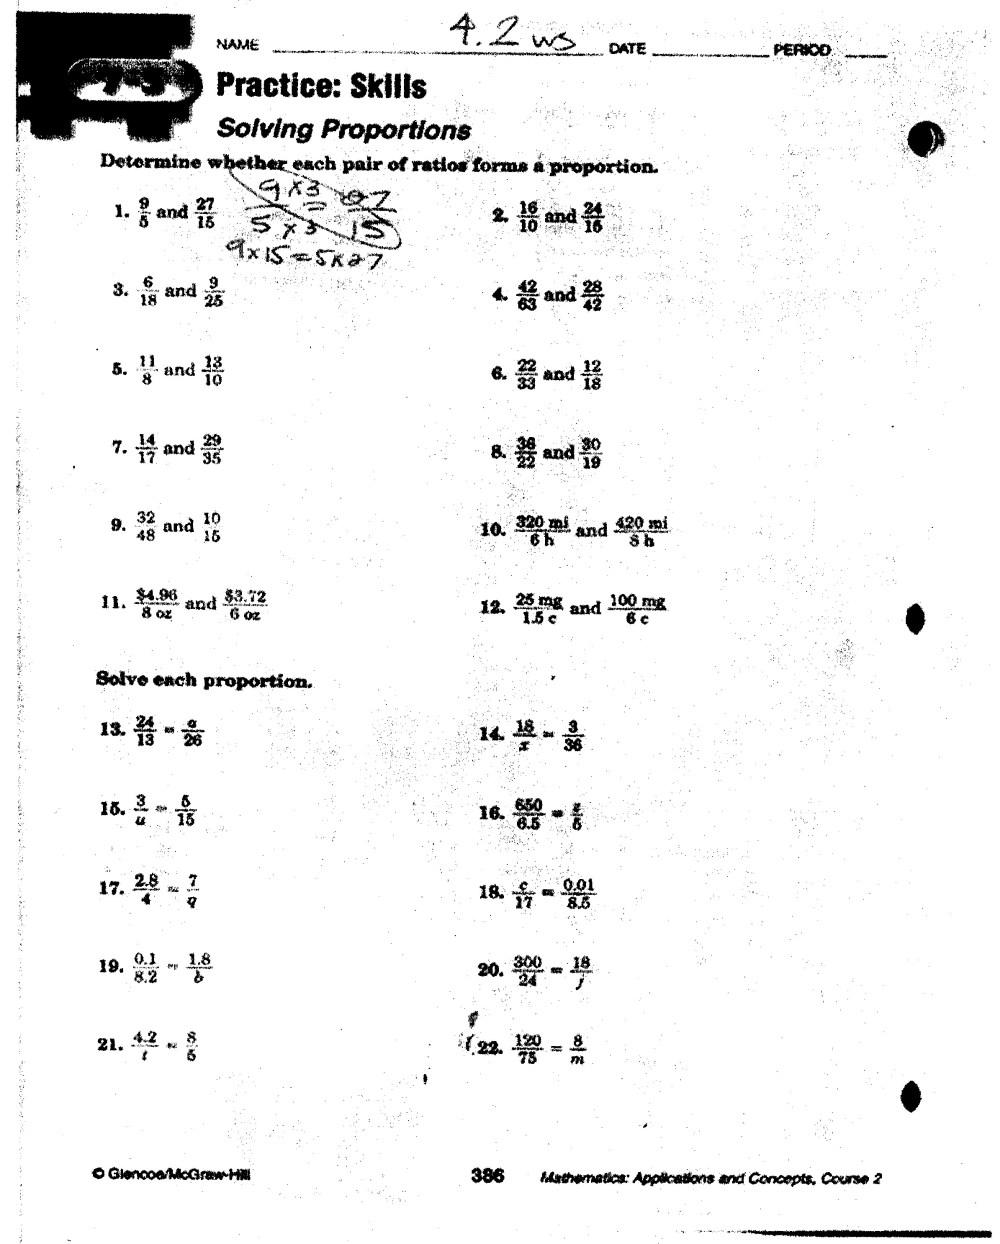 medium resolution of 34 Solving Proportions Worksheet Answers - Worksheet Resource Plans